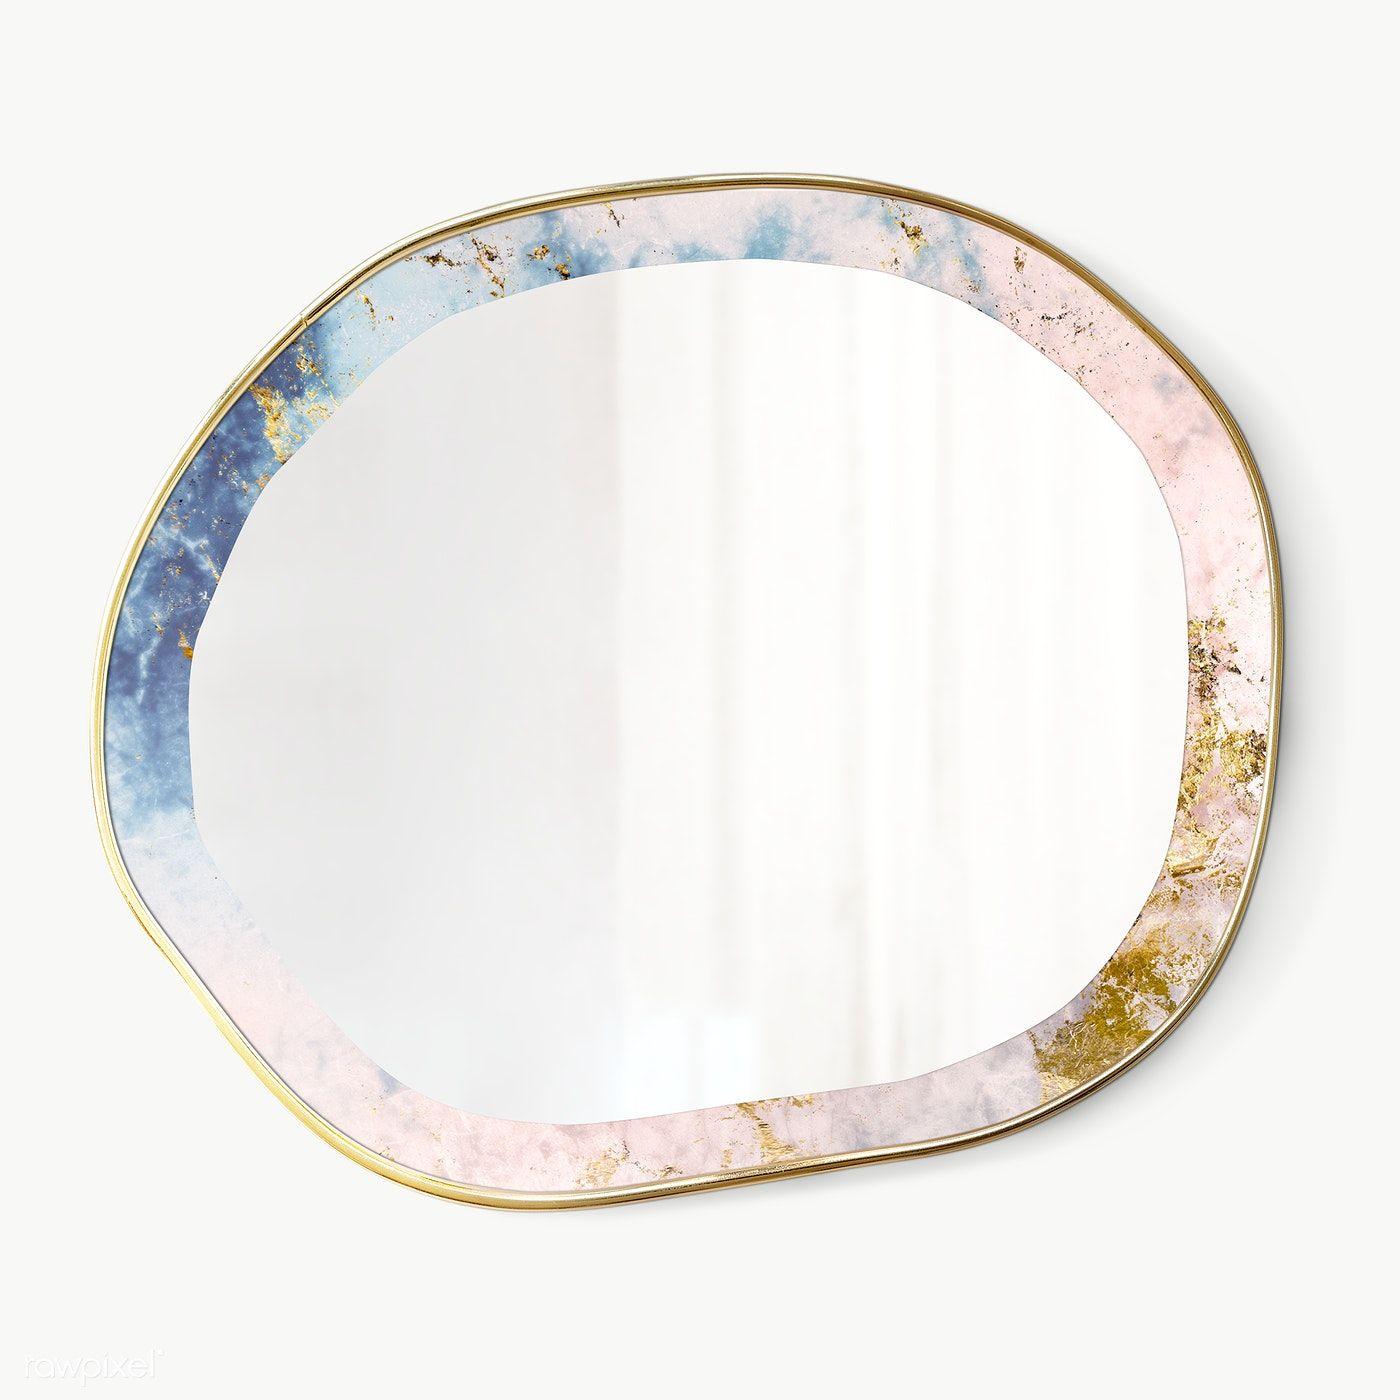 Download Premium Png Of Marbled Framed Mirror Transparent Png 2036839 In 2020 Marble Frame Mirror Gold Framed Mirror Marble Frame